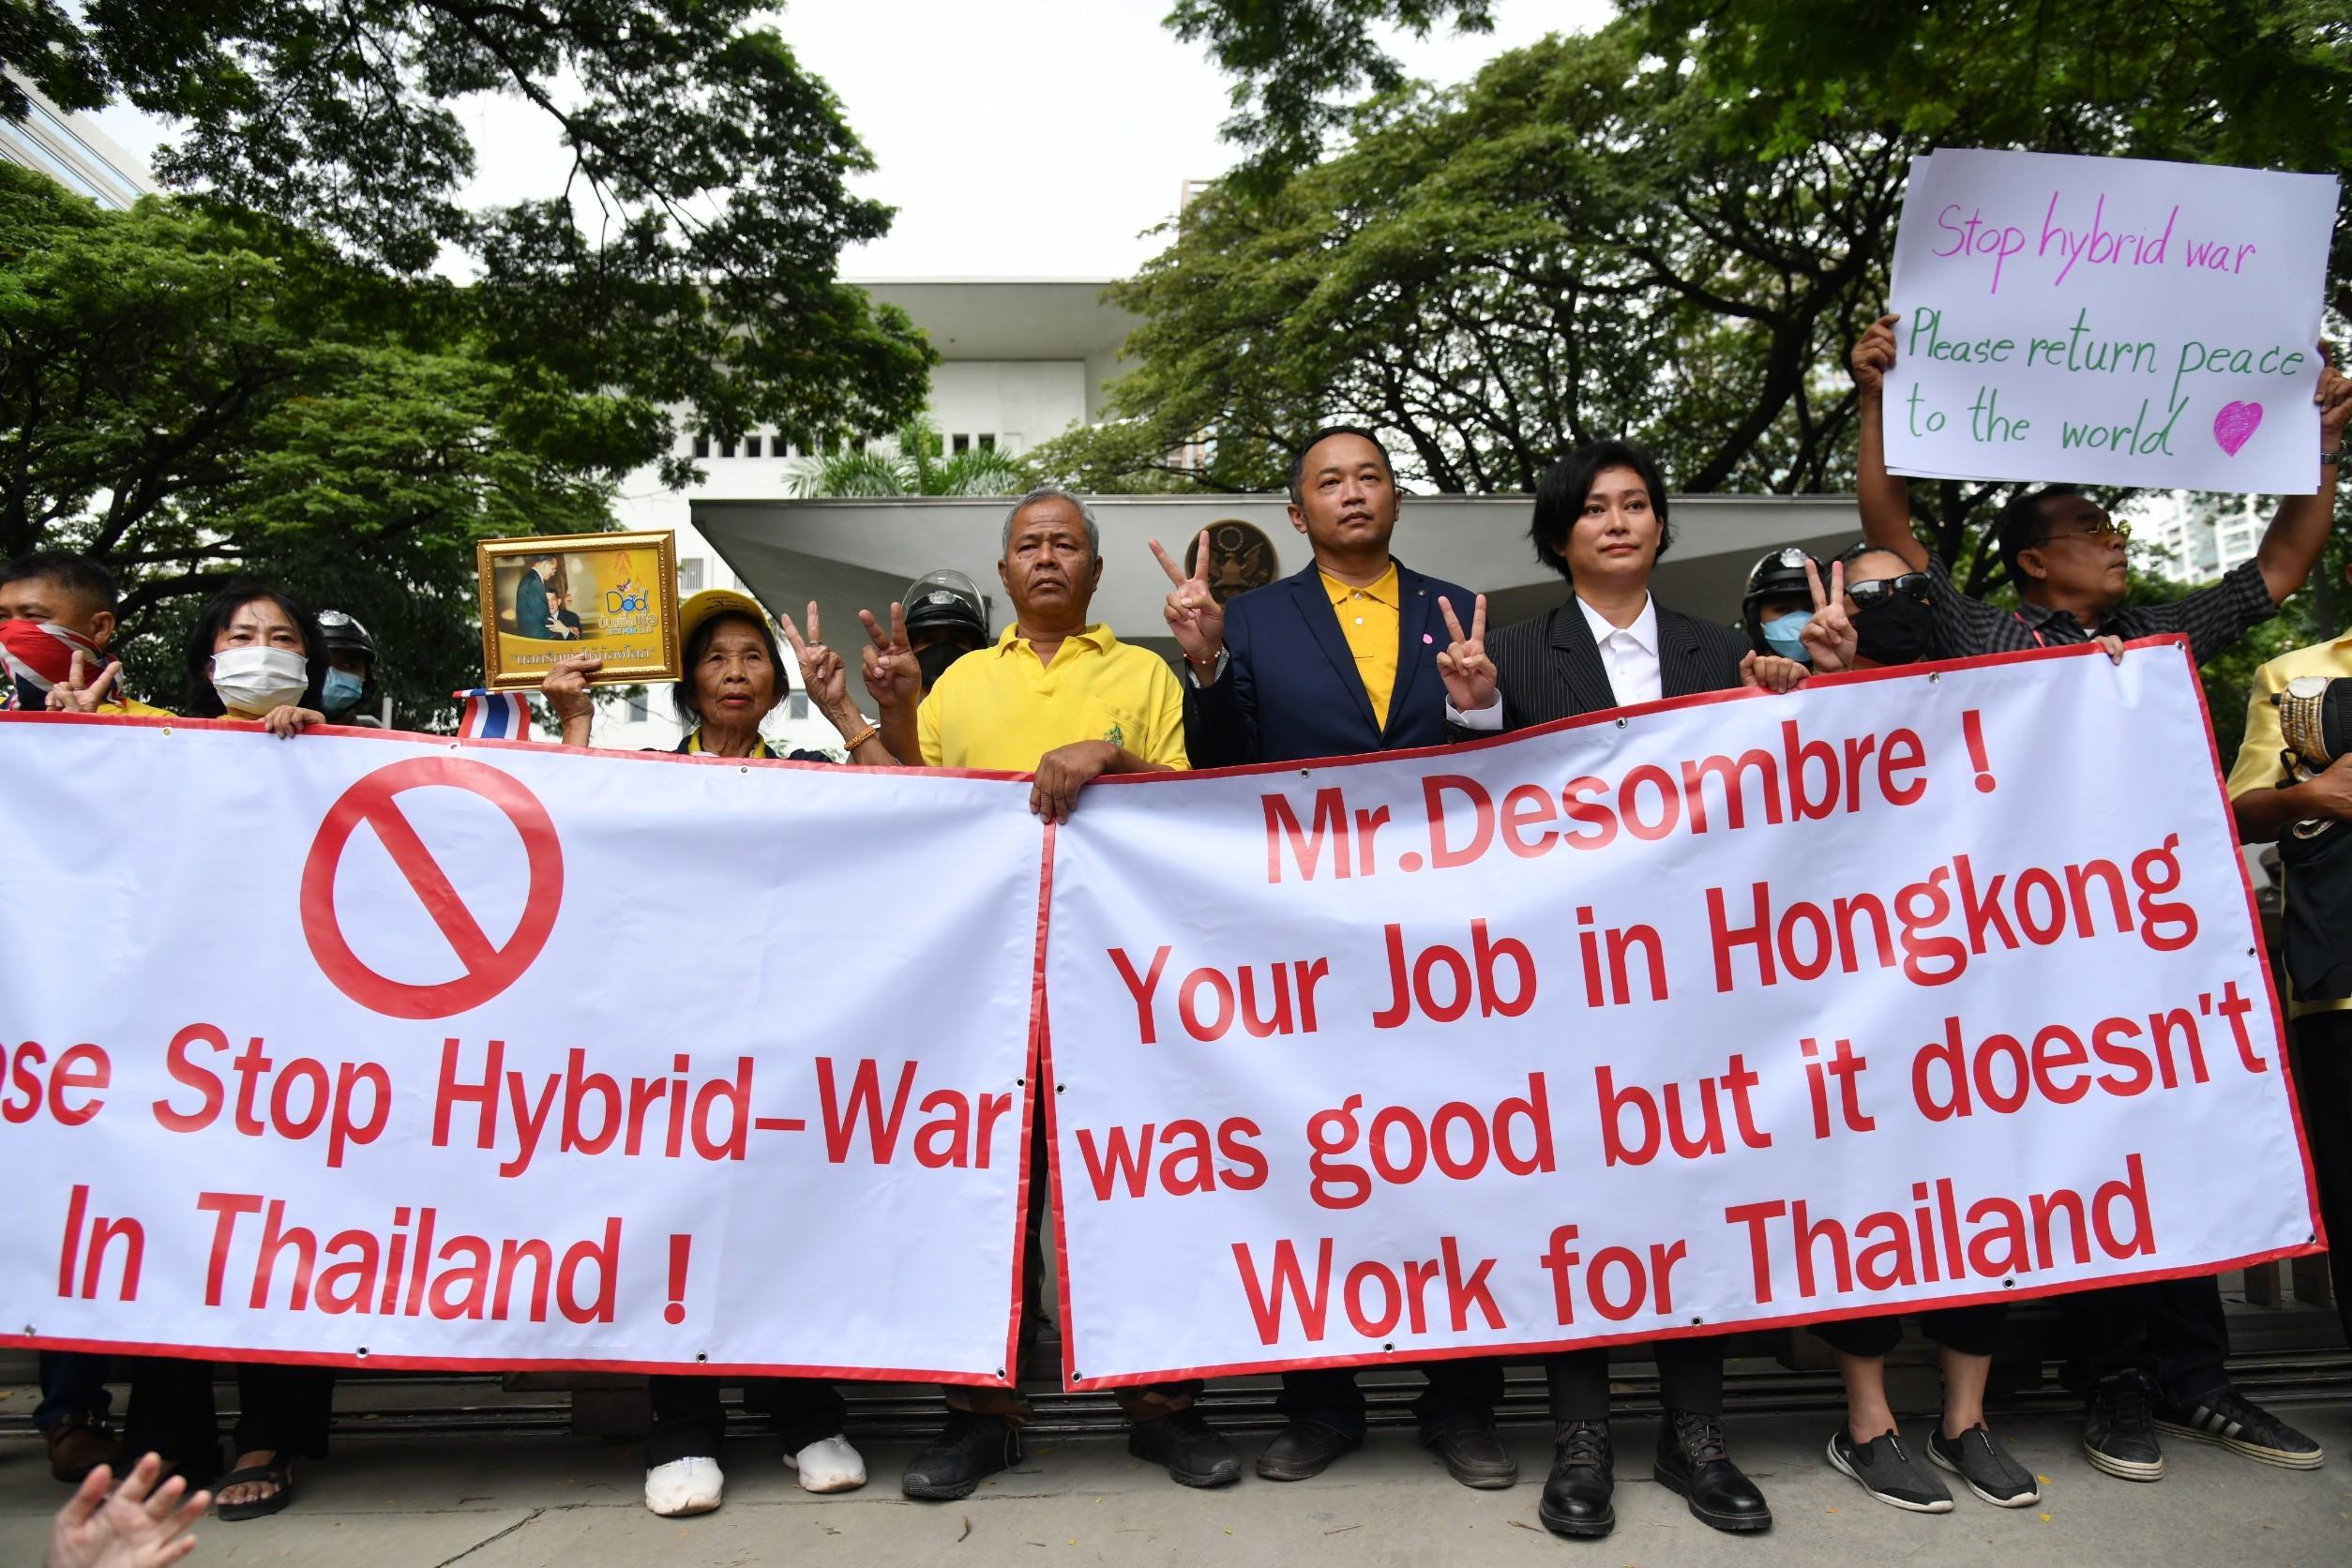 www.thaiguide.dk/images/forum/Demo-2020/demo-us-ambassade-27-10-20.jpg